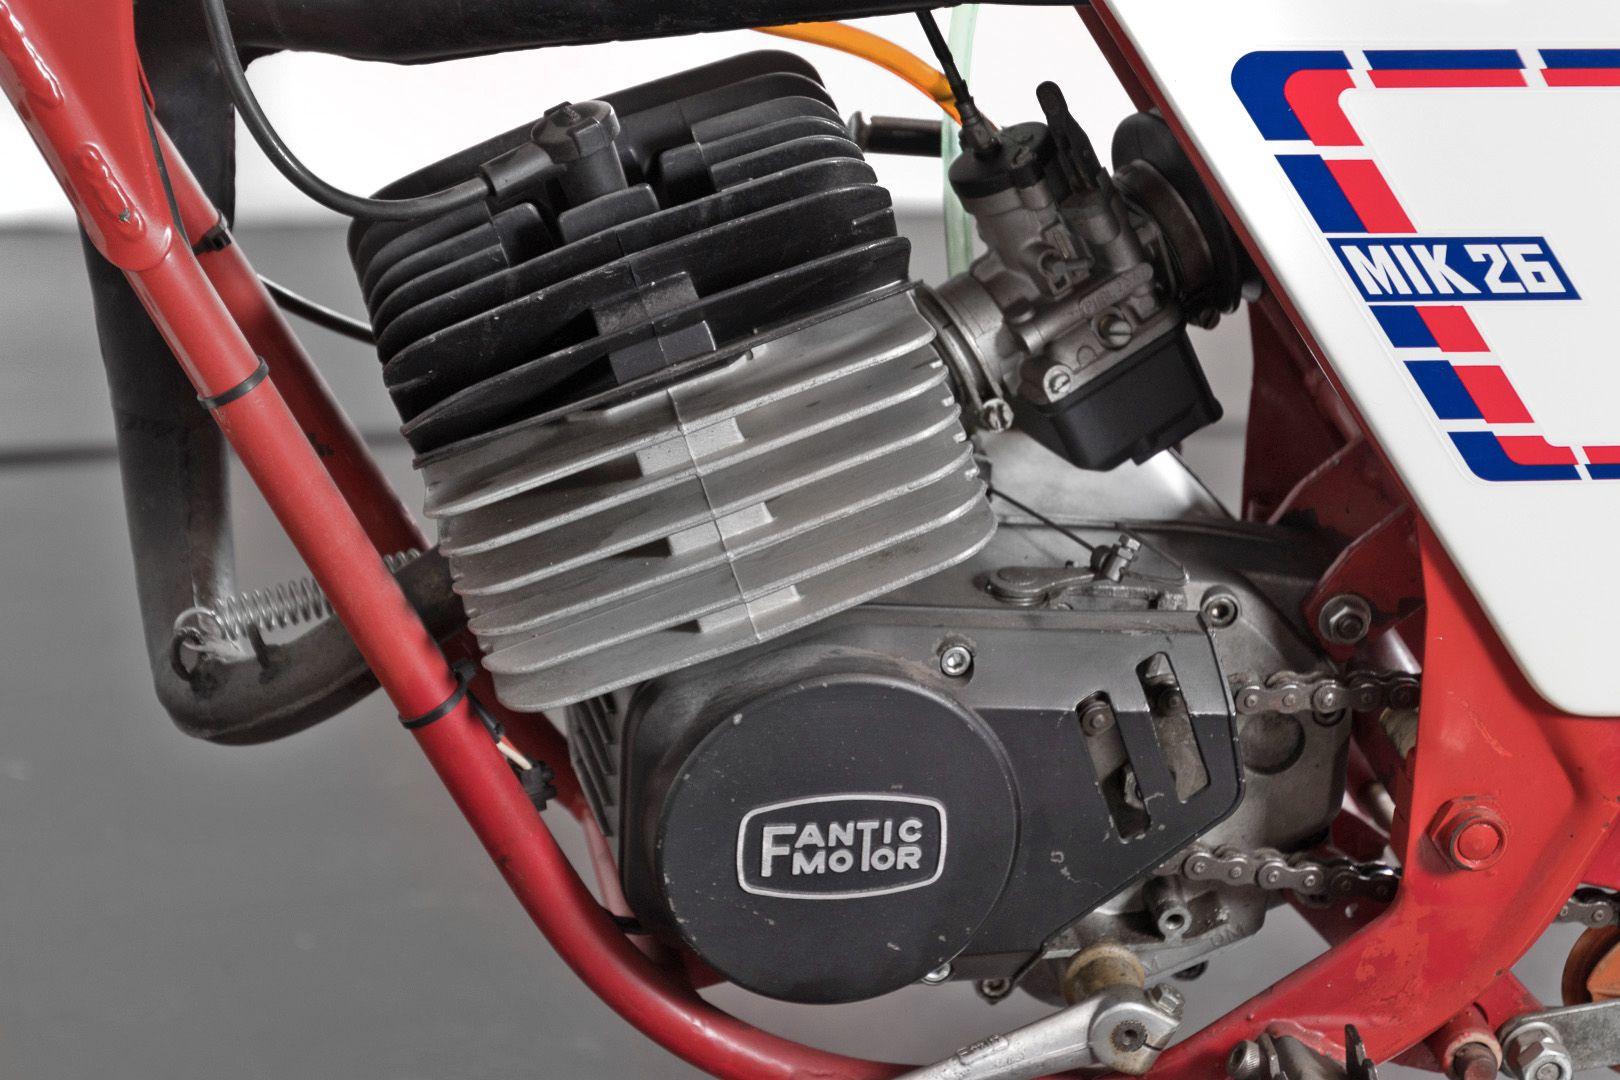 1980 Fantic Motor Caballero 50 74658